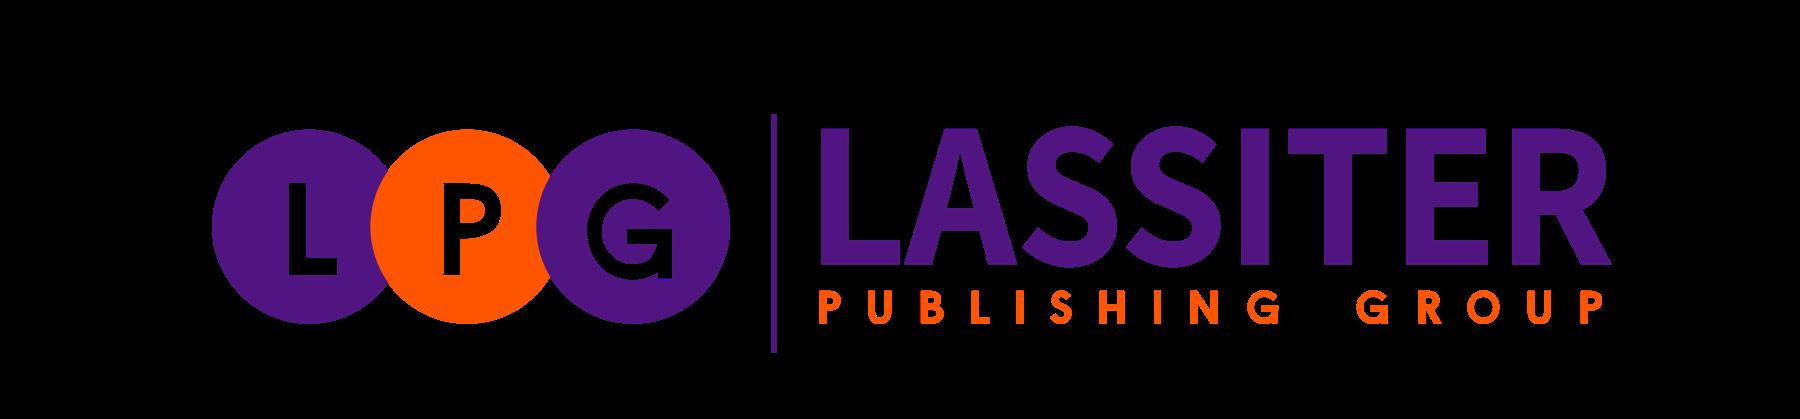 Lassiter Publishing Group